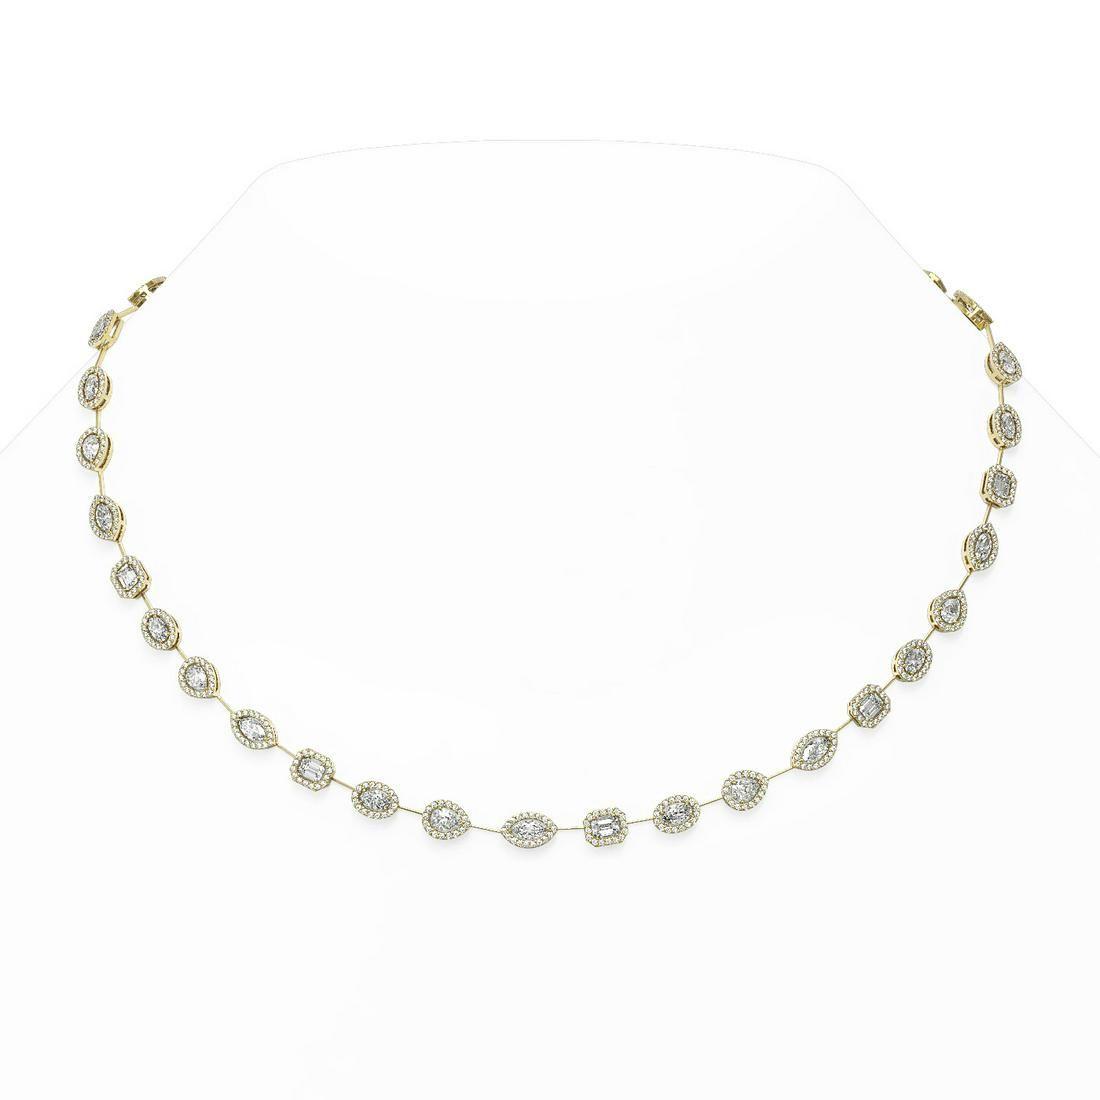 15 ctw Mix Cut Diamonds Designer Necklace 18K Yellow